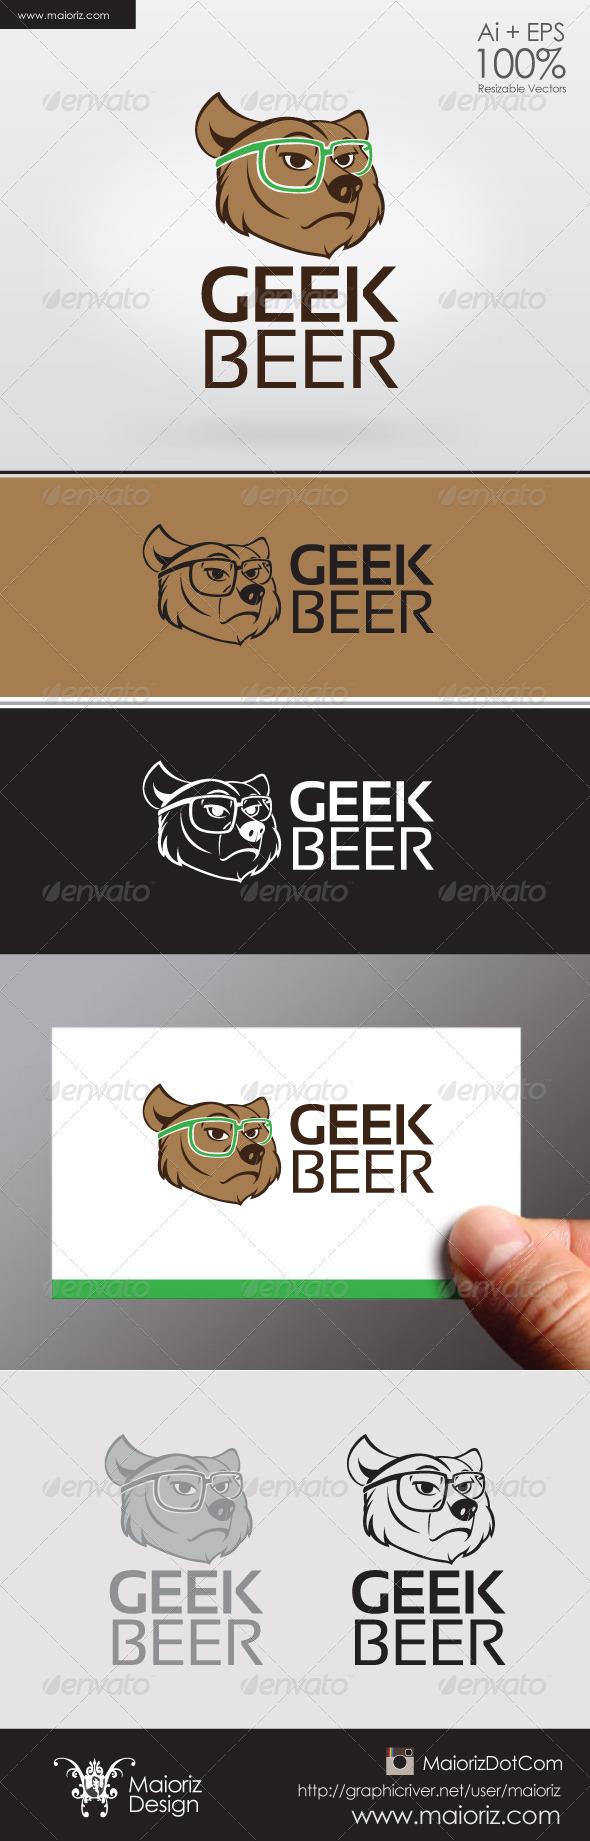 GraphicRiver Geek Beer Logo 6406878